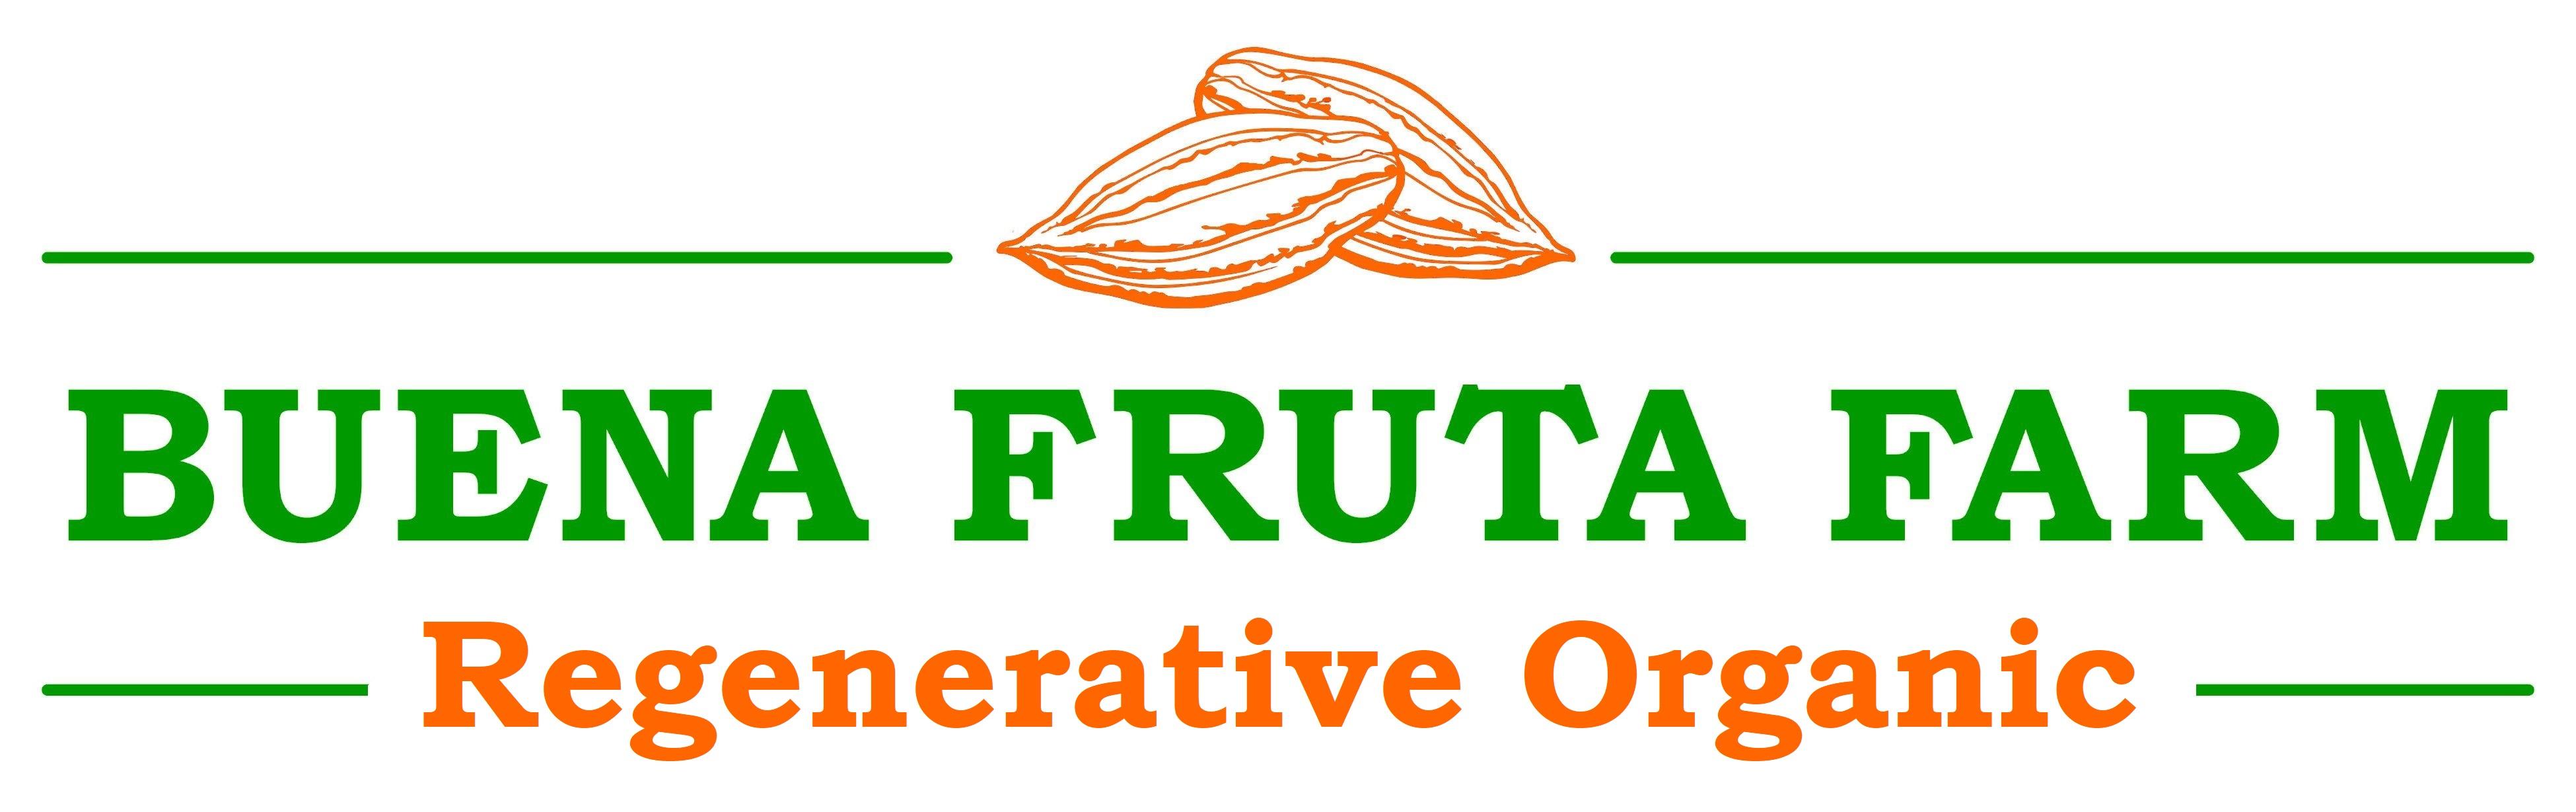 logo-horizontal-regenerative-organic-406kb.jpg